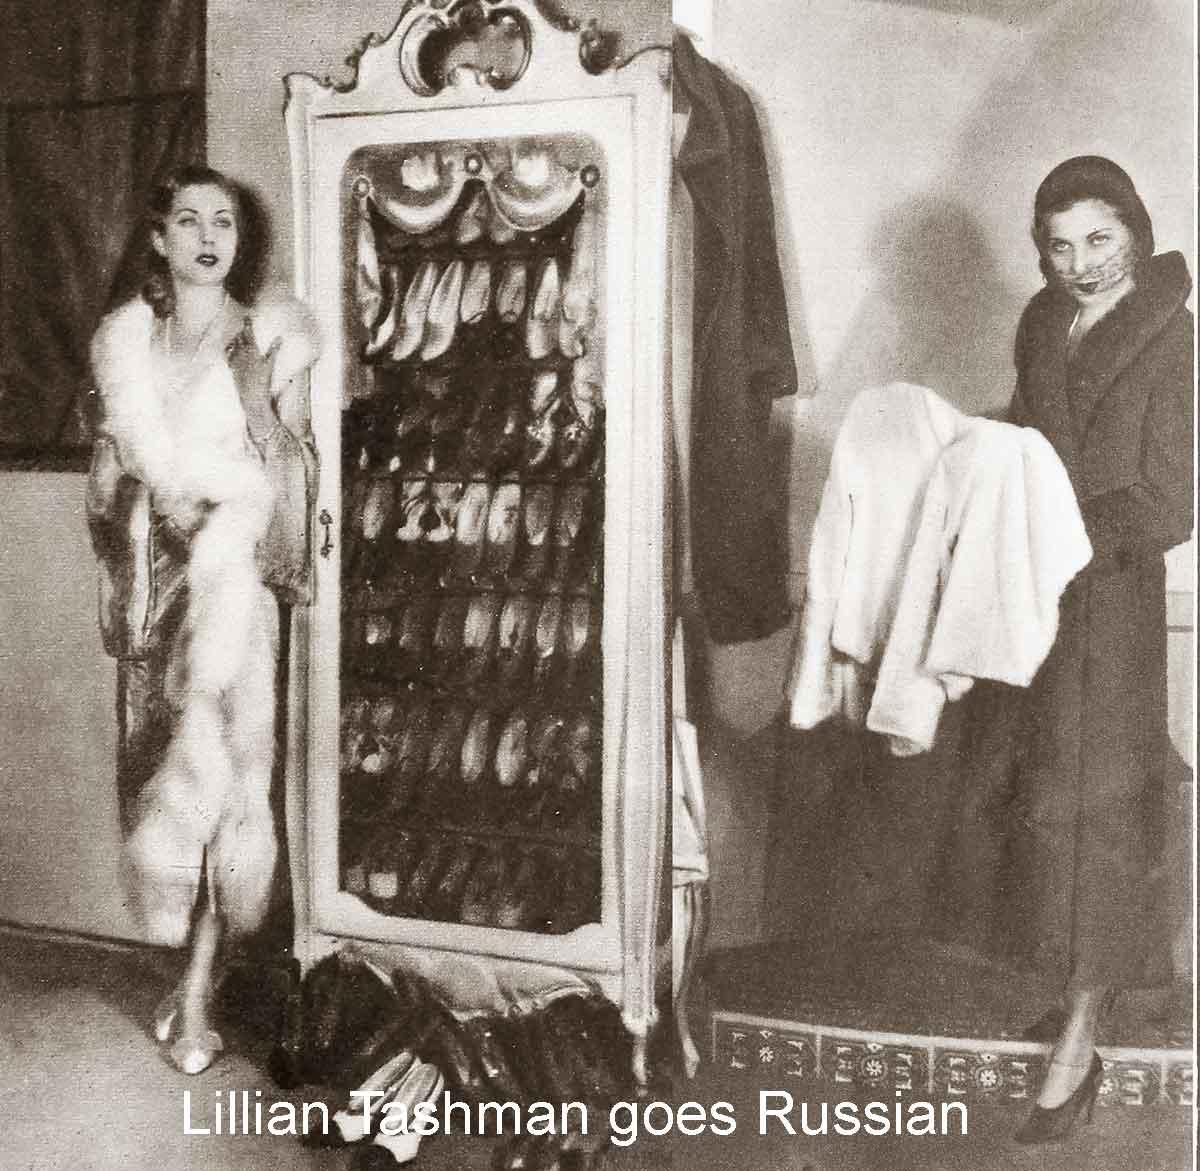 1930 Fashion – Winter Styles Turn Russian